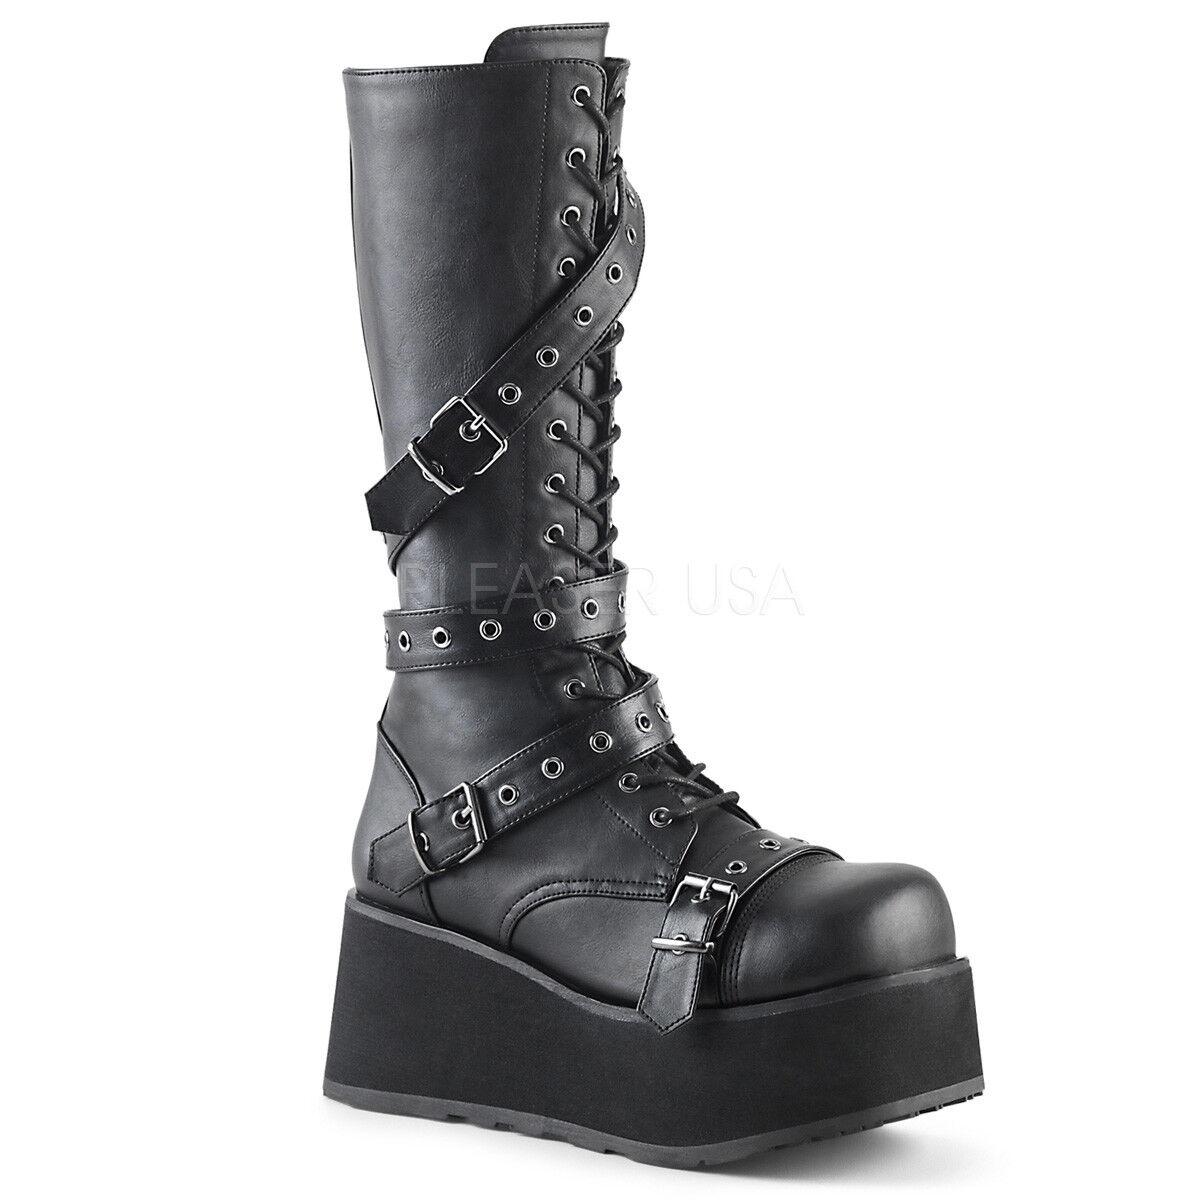 Demonia TRASHVILLE-520 Men's Black Vegan Leather Platform Grommet Knee High Boot